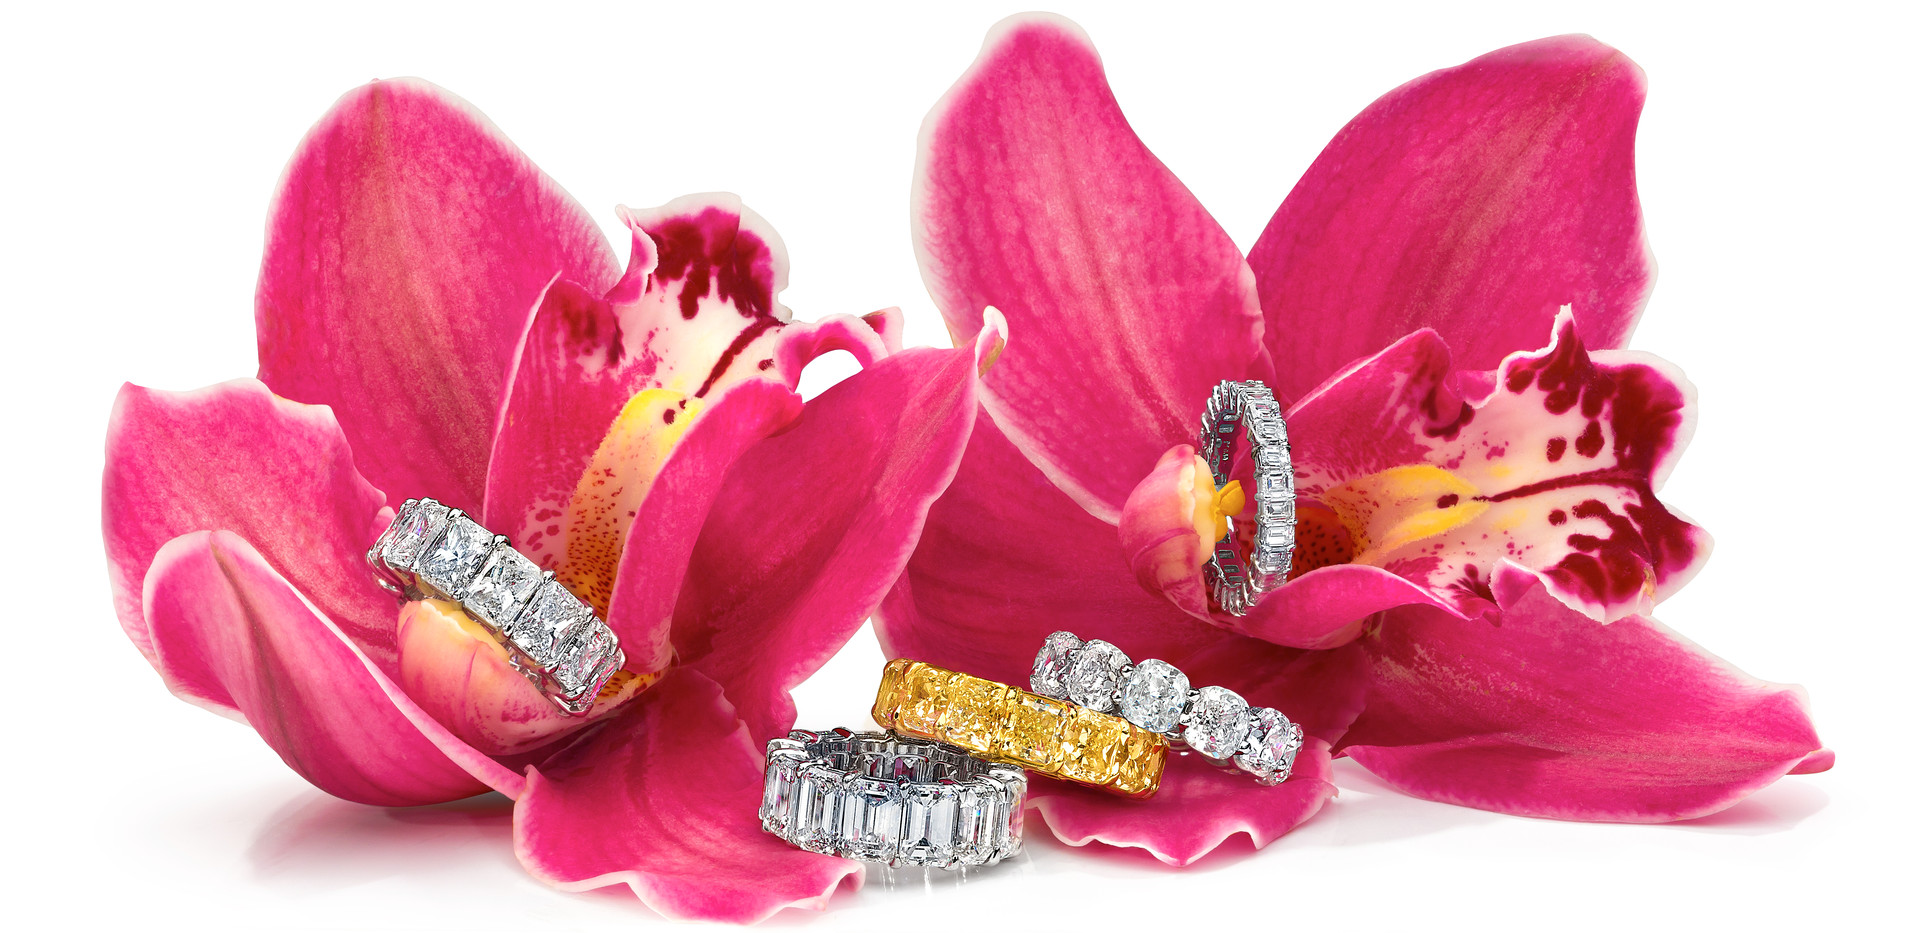 Eternity Diamond Ring in Orcid 2.jpg